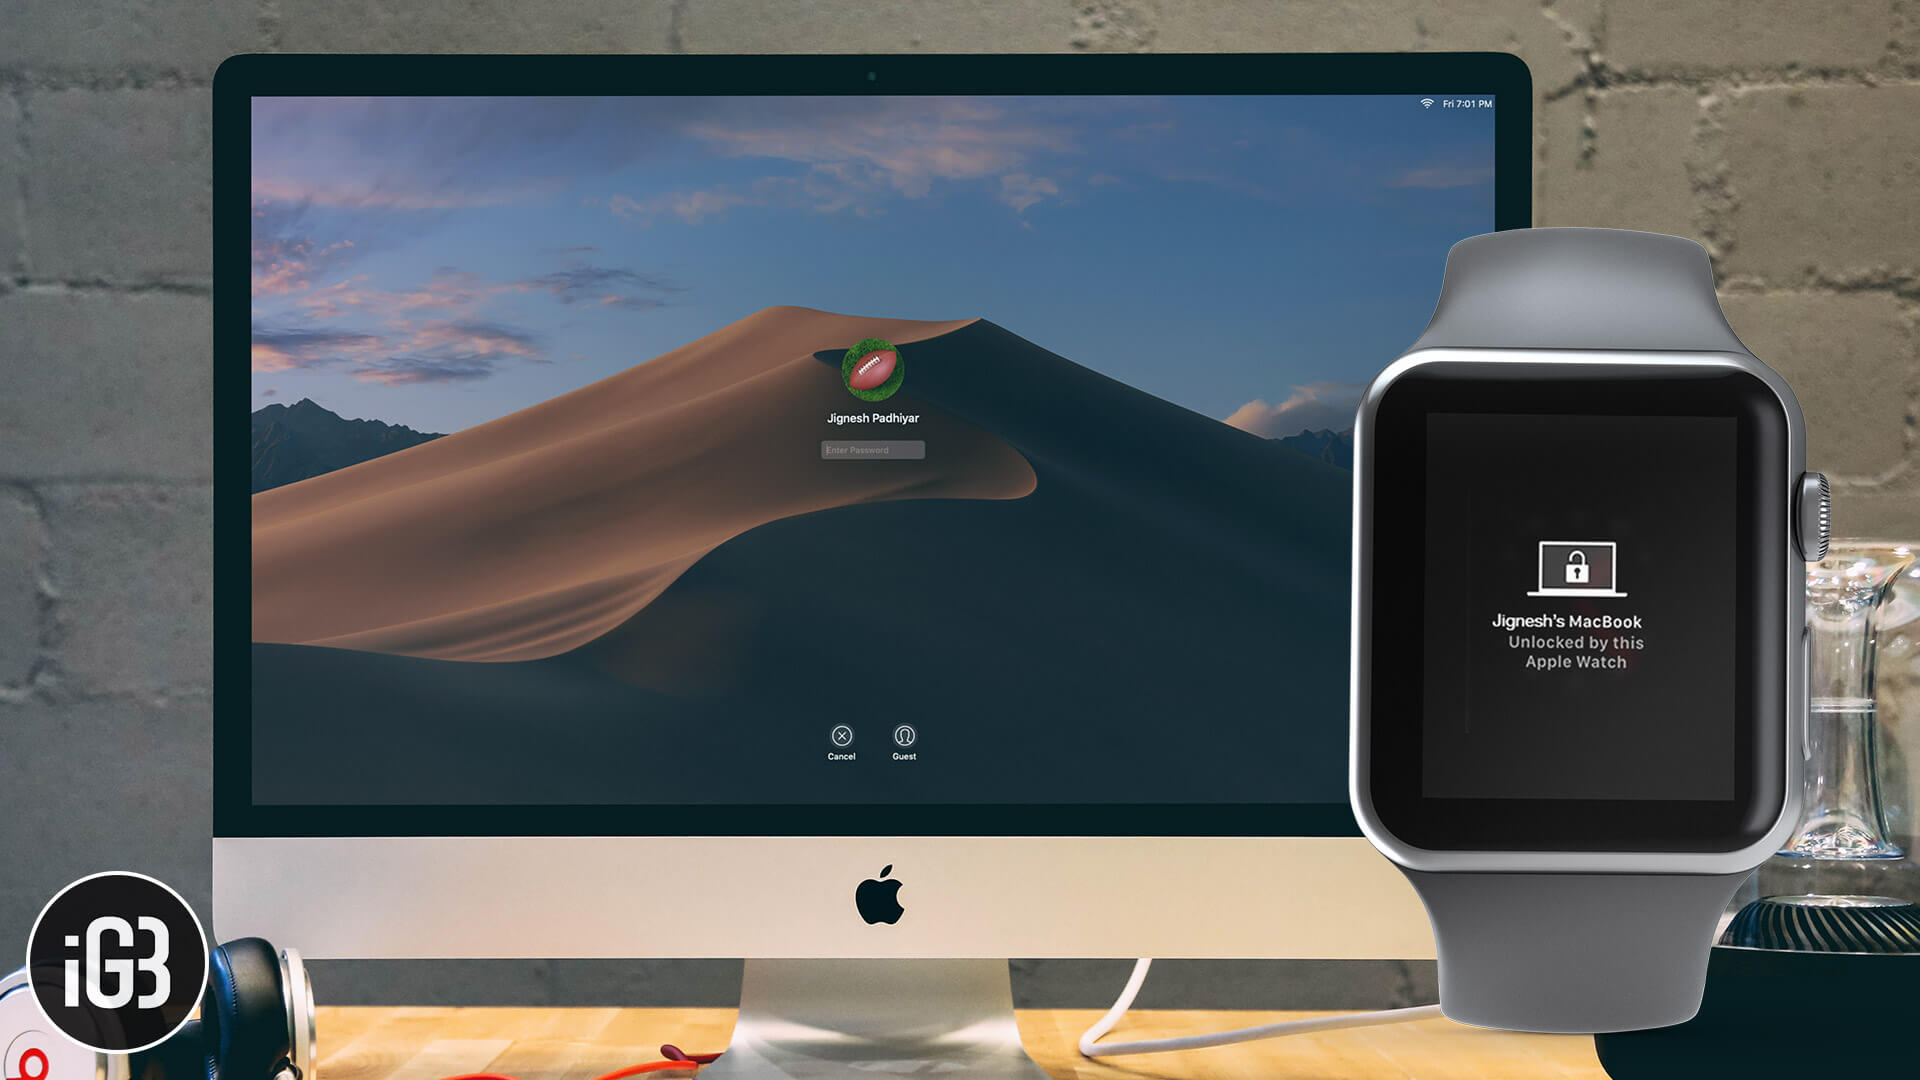 Cannot Unlock Mac with Apple Watch